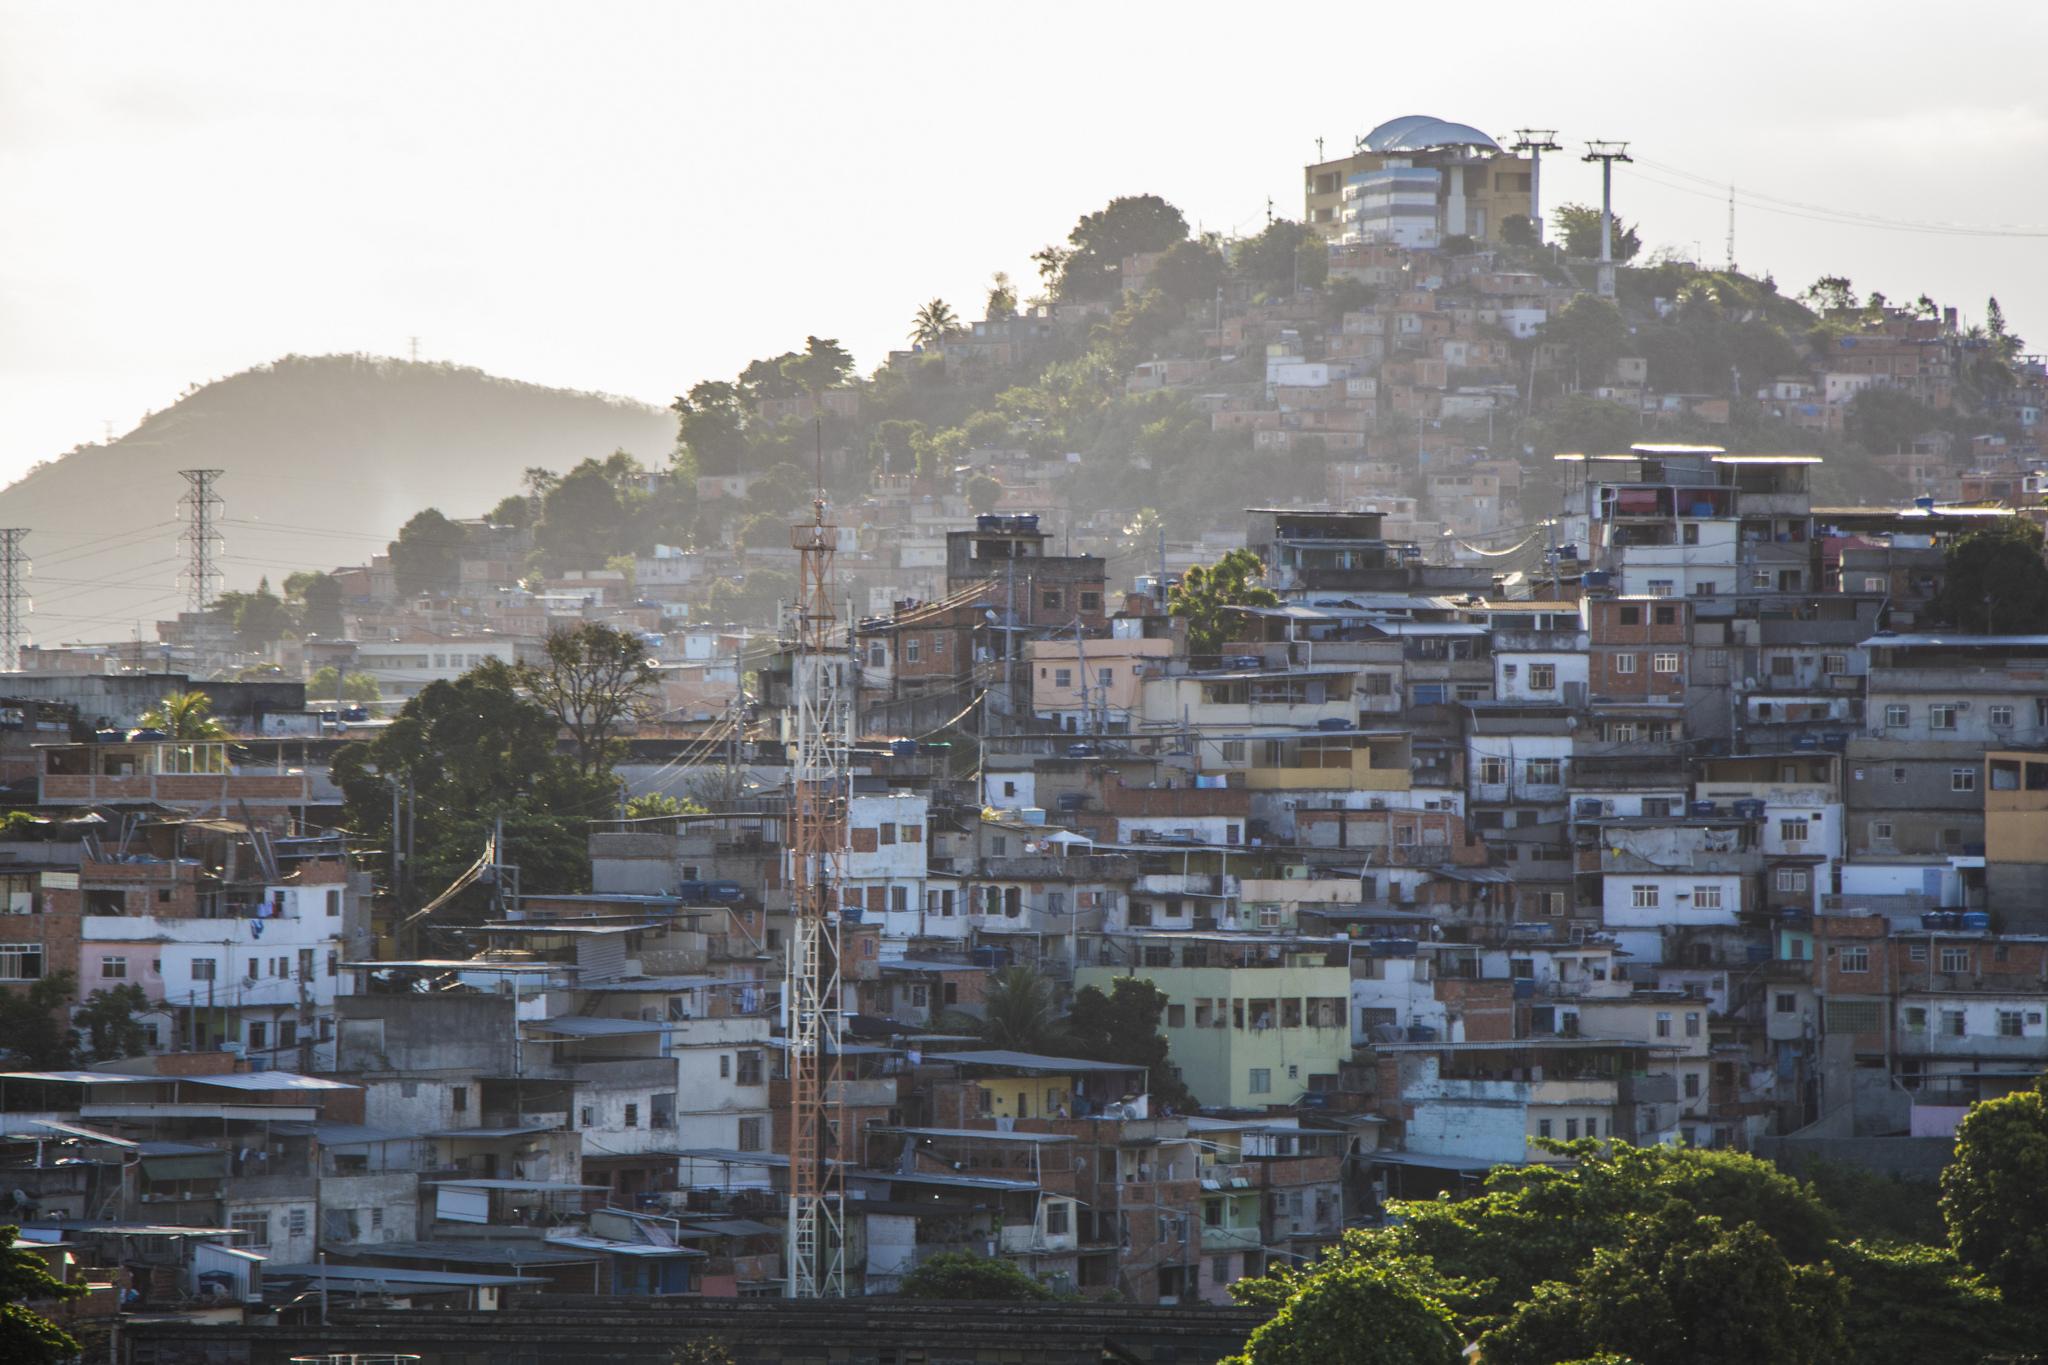 Complexo do Alemão by Antoine Horenbeek